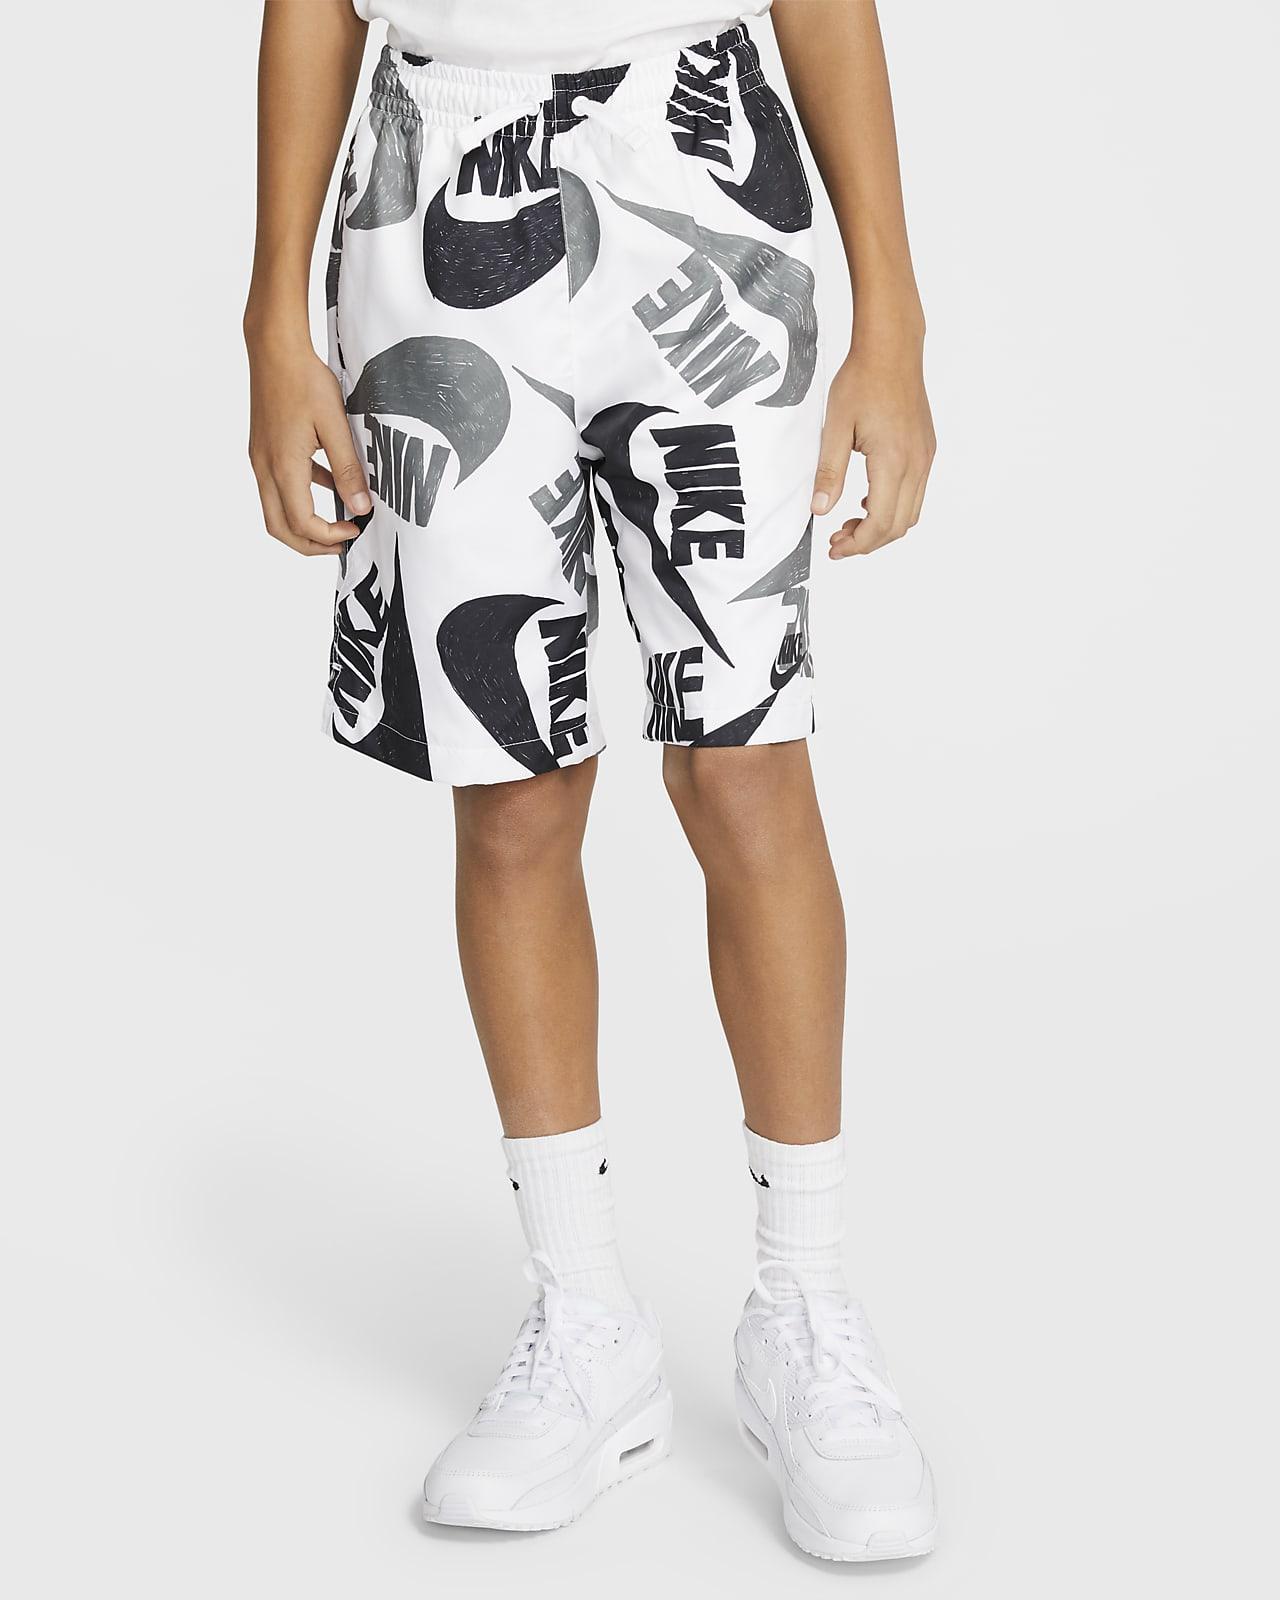 Nike Sportswear Older Kids' (Boys') Woven Printed Shorts